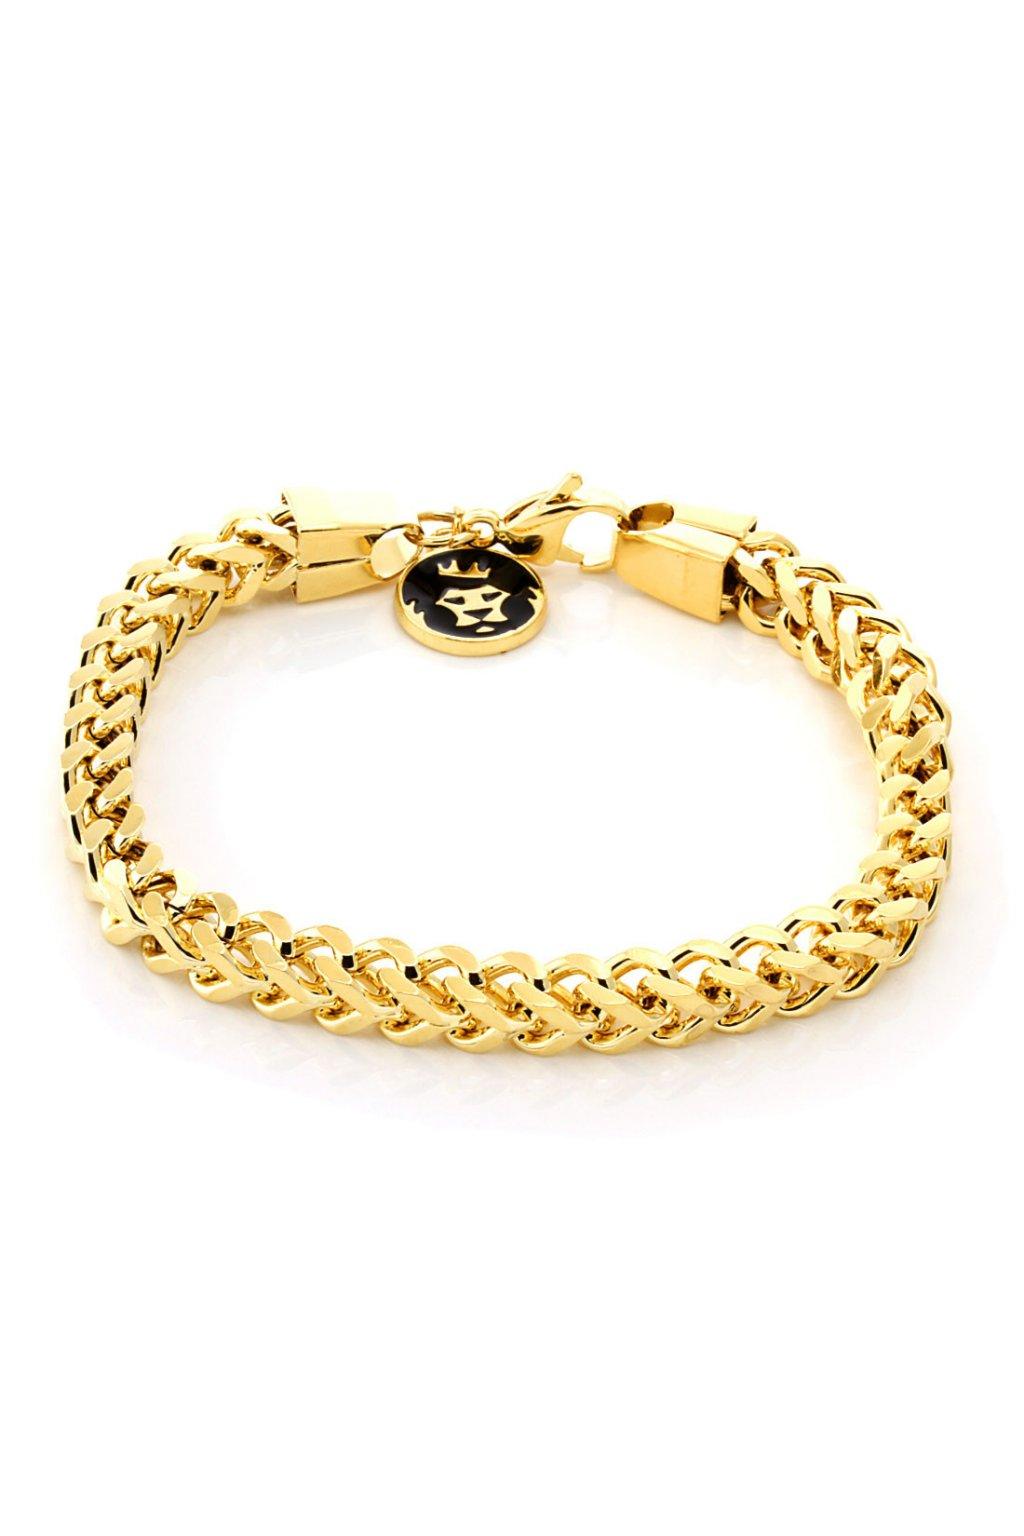 brx11782 6mm gold skeleton franco chain bracelet 3